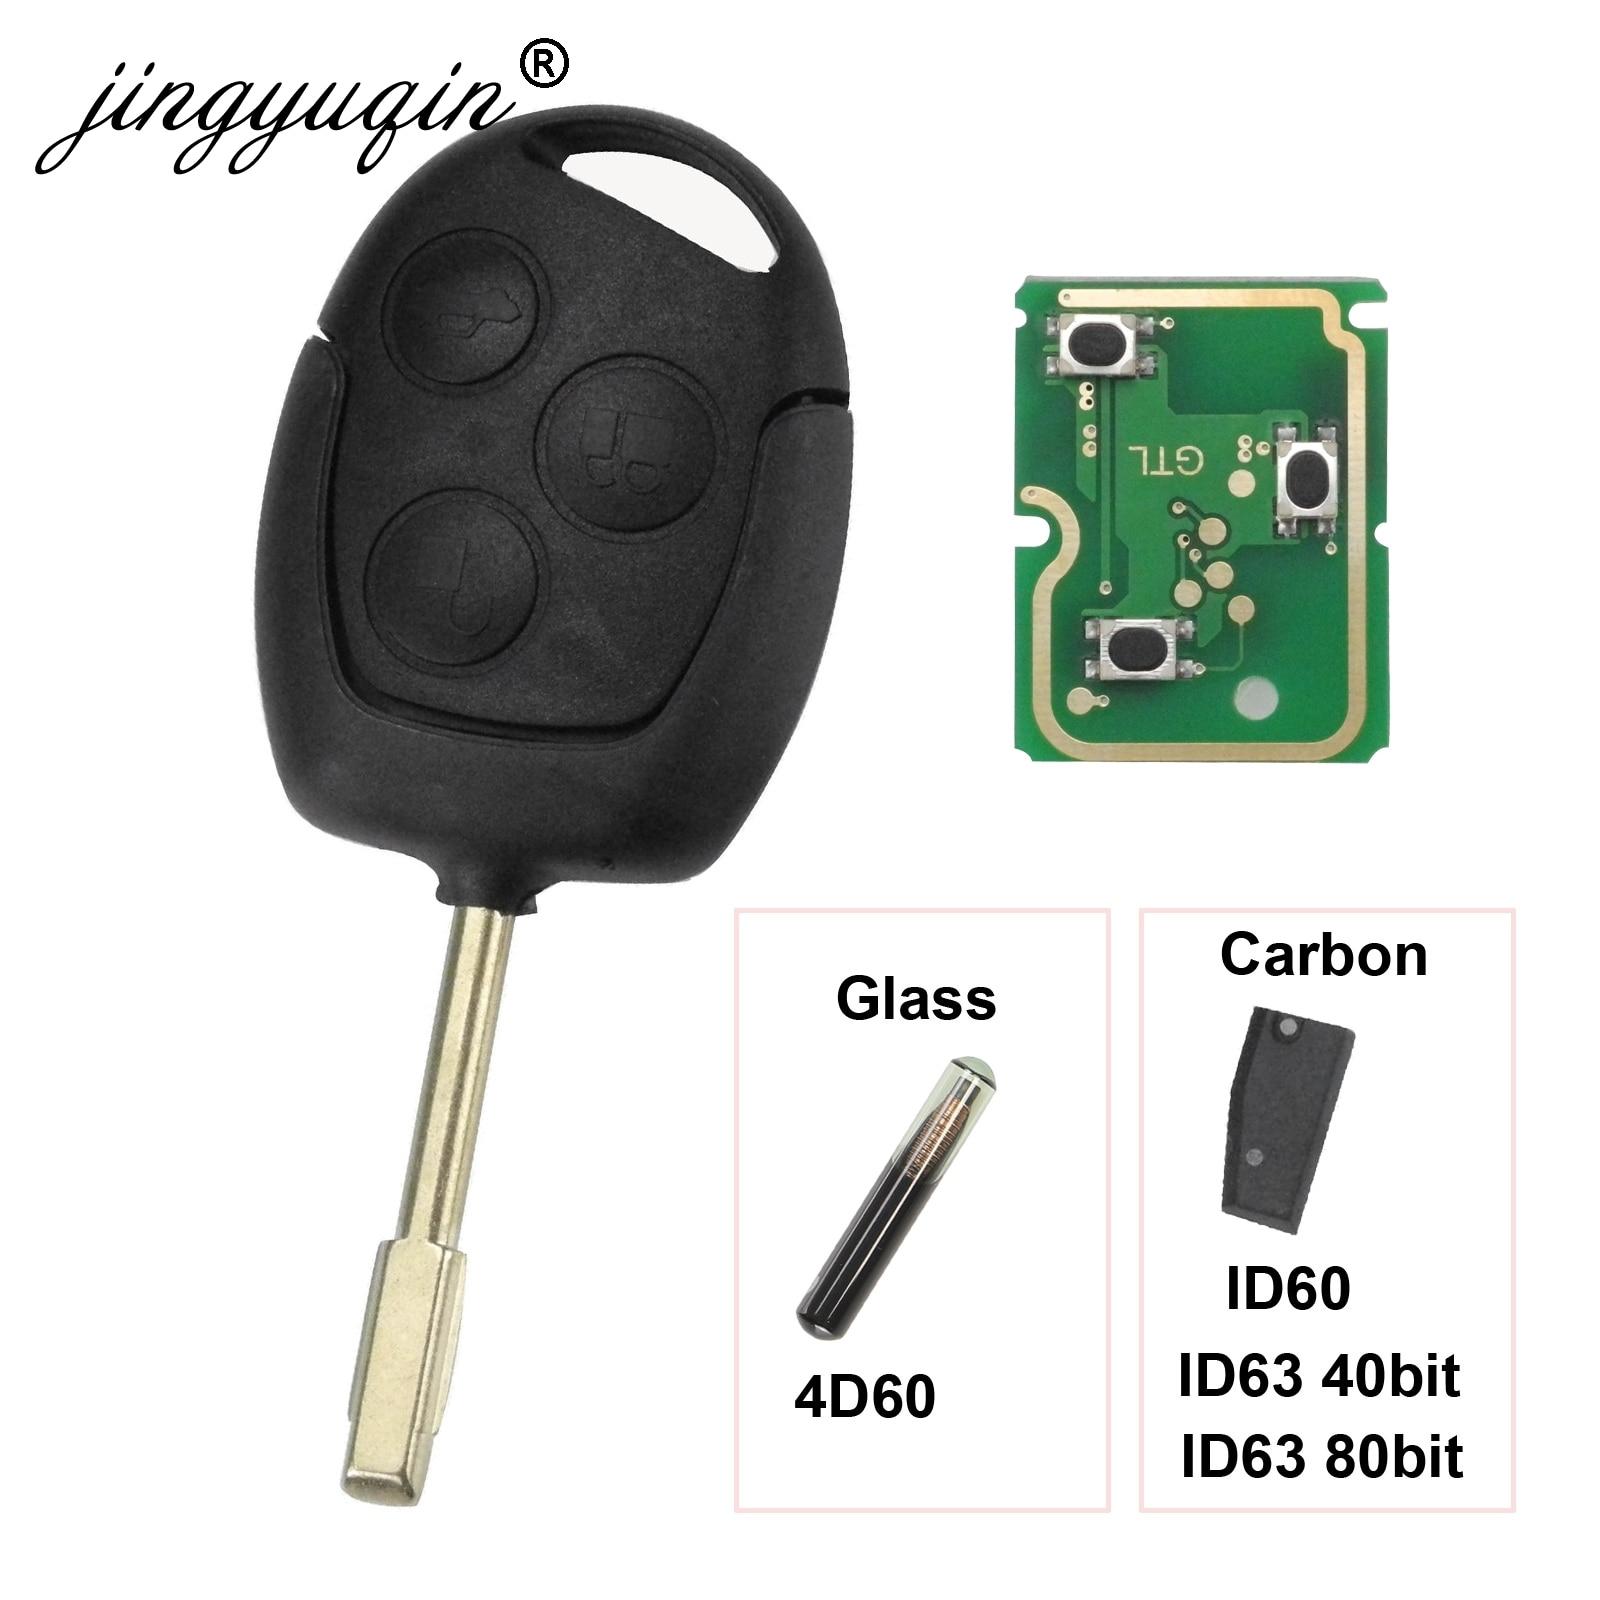 Jingyuqin 3 кнопки дистанционный ключ брелок 315 МГц 433 МГц 4D60 ID63 чип для Ford Mondeo Focus Fusion Fiesta Galaxy Transit Full Car Key